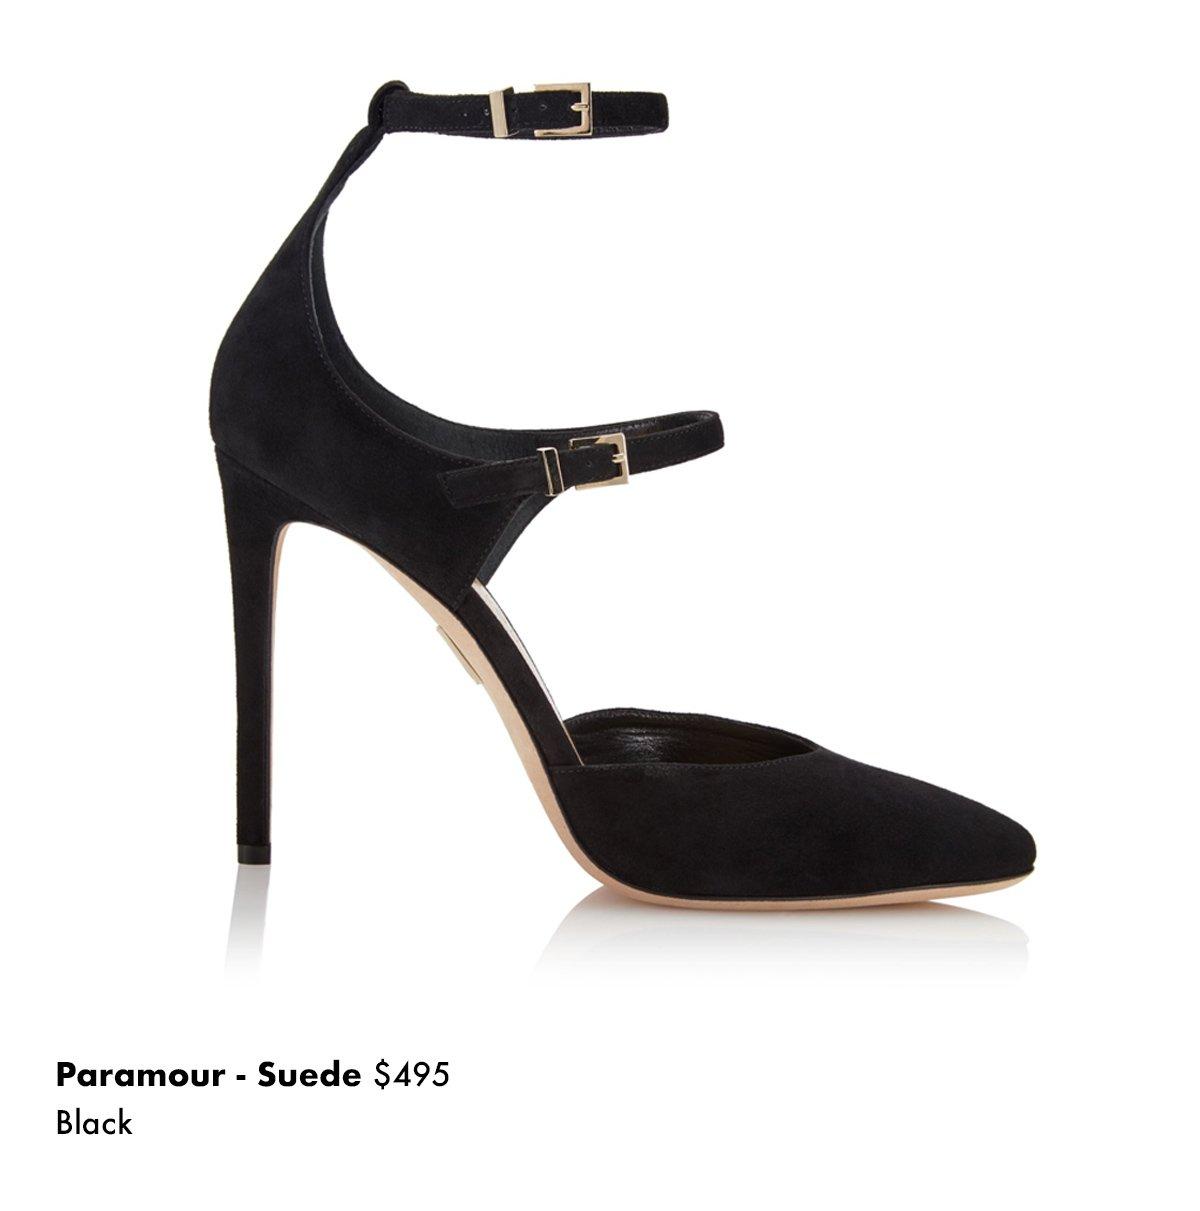 Paramour - Suede Black